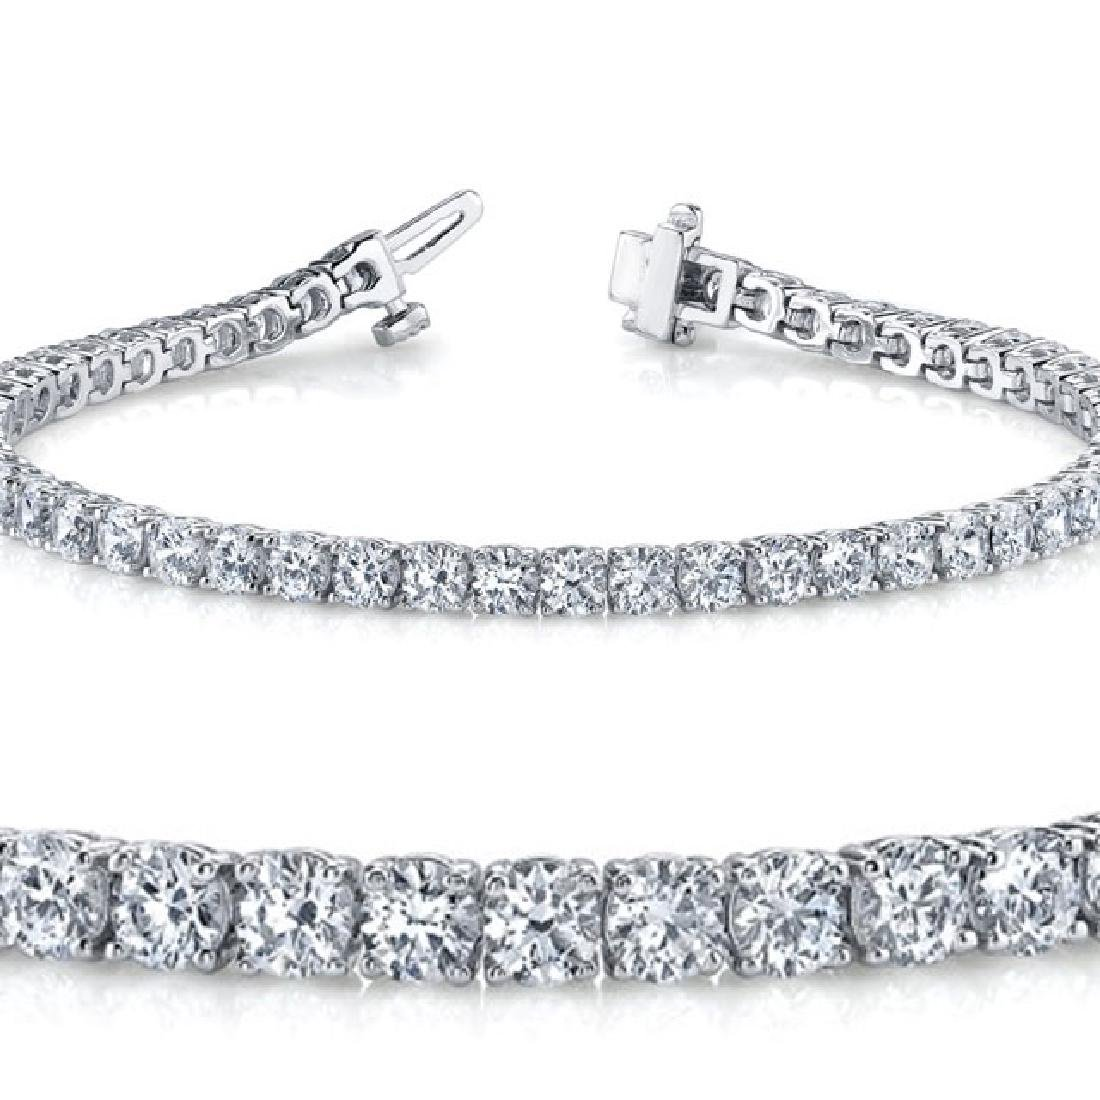 Natural 5ct VS-SI Diamond Tennis Bracelet Platinum -